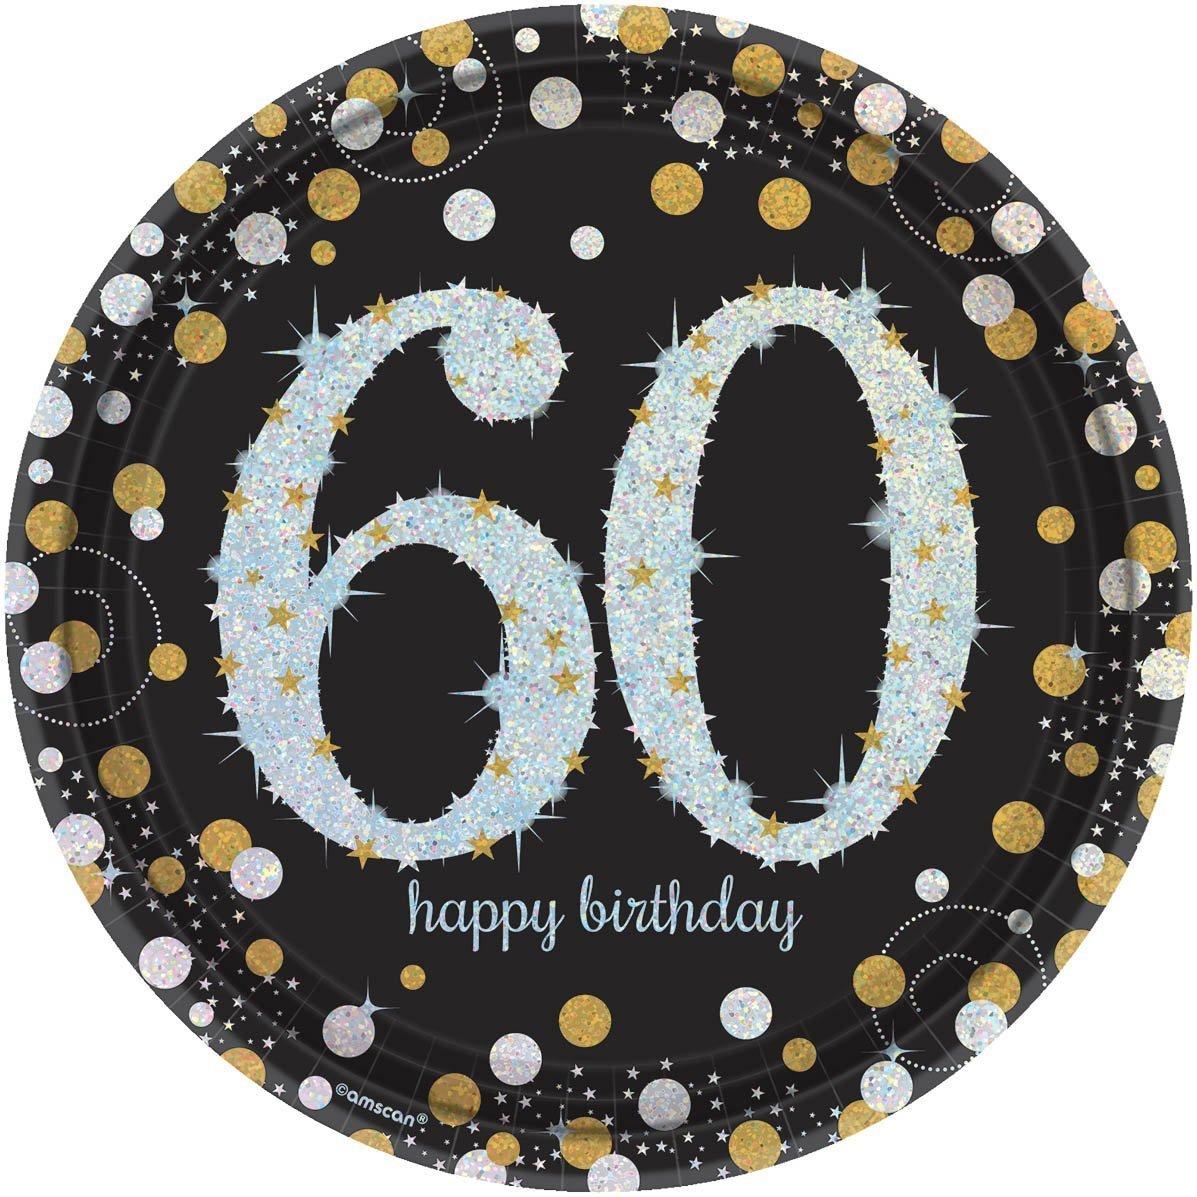 Amscan 551547 Sparkling Celebration 60 Round Prismatic Plates Party Supplies 9 Multicolor